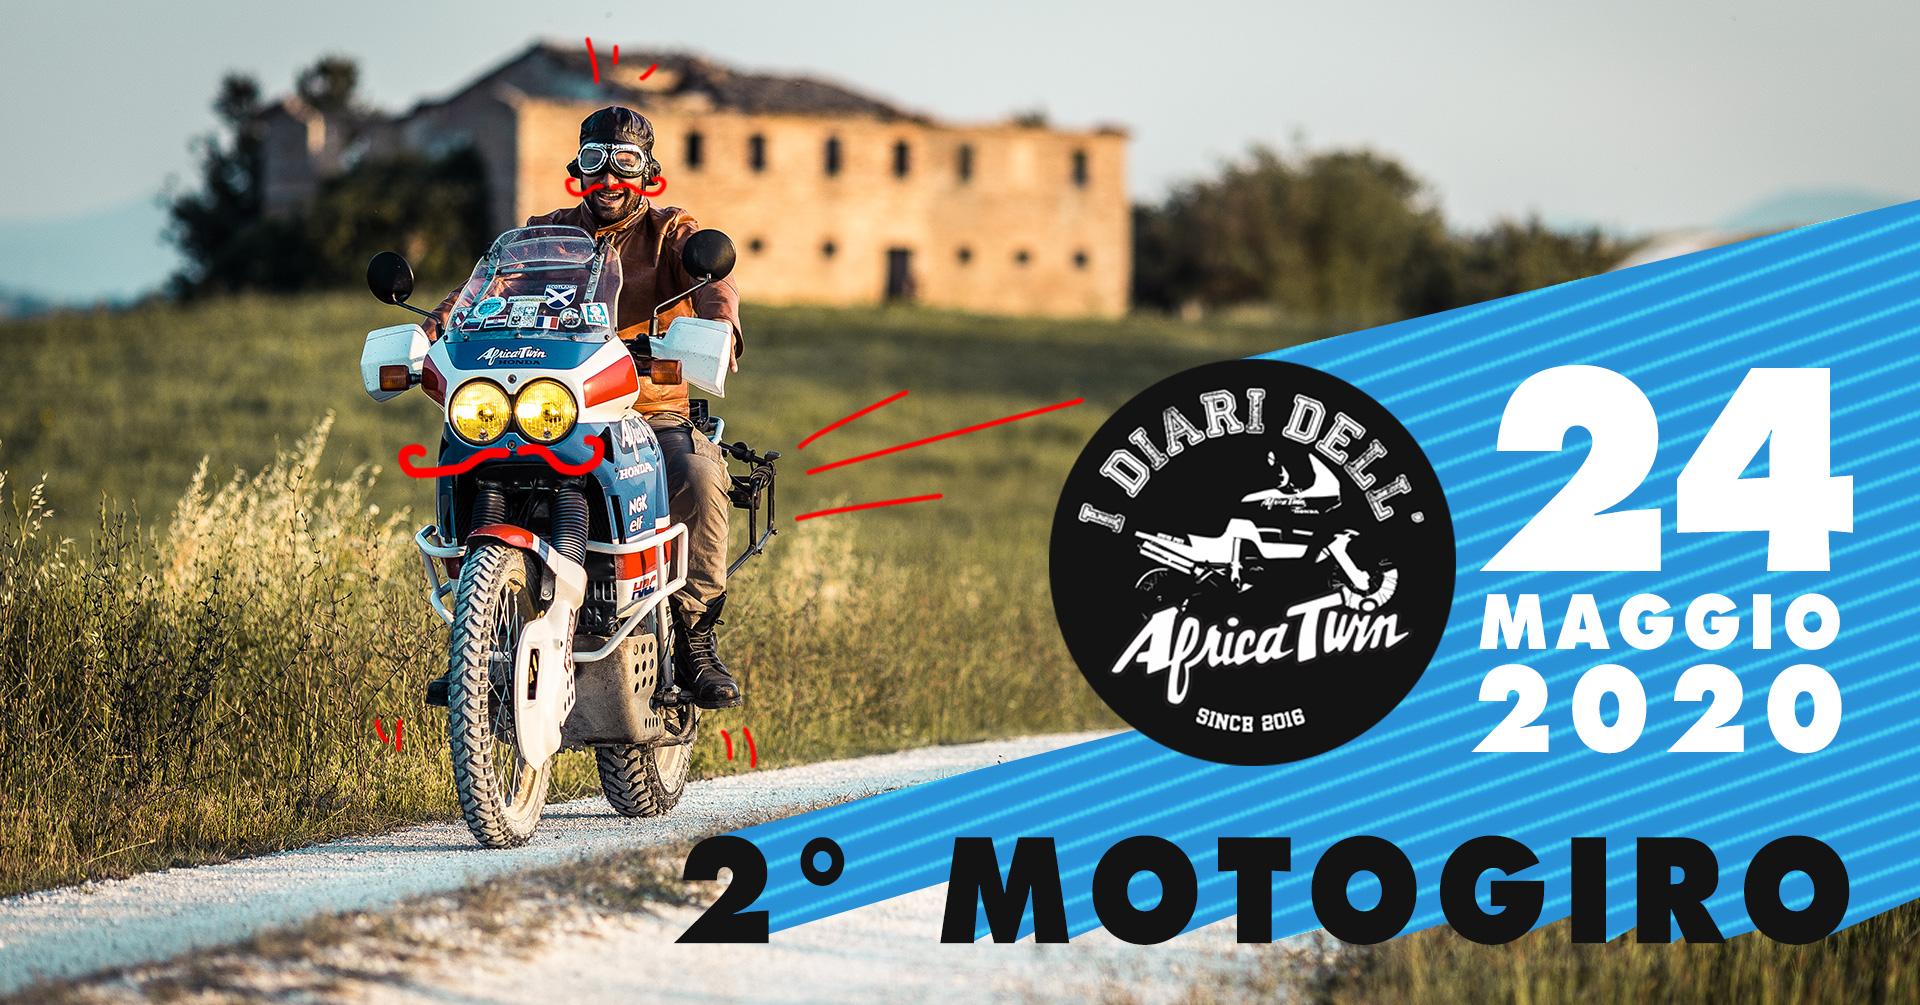 2-motogiro-diari-africa-twin-24-maggio-2020